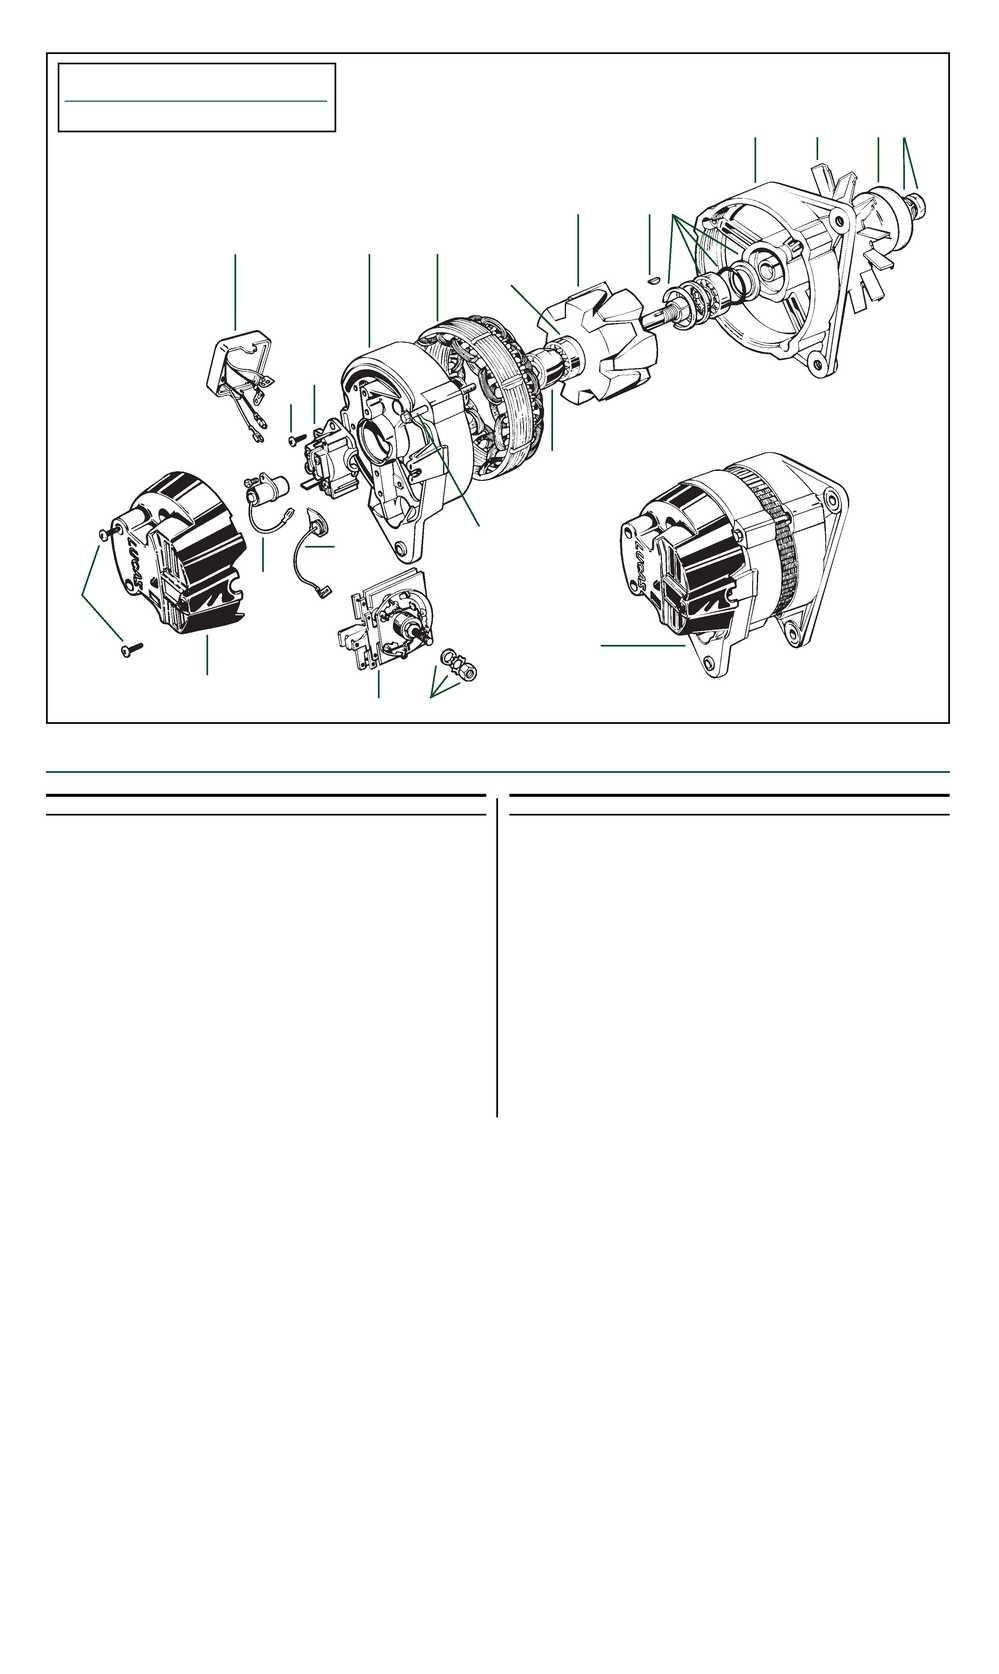 Roadster Factory Lucas Model 16acr Alternators Tr6 Assembly